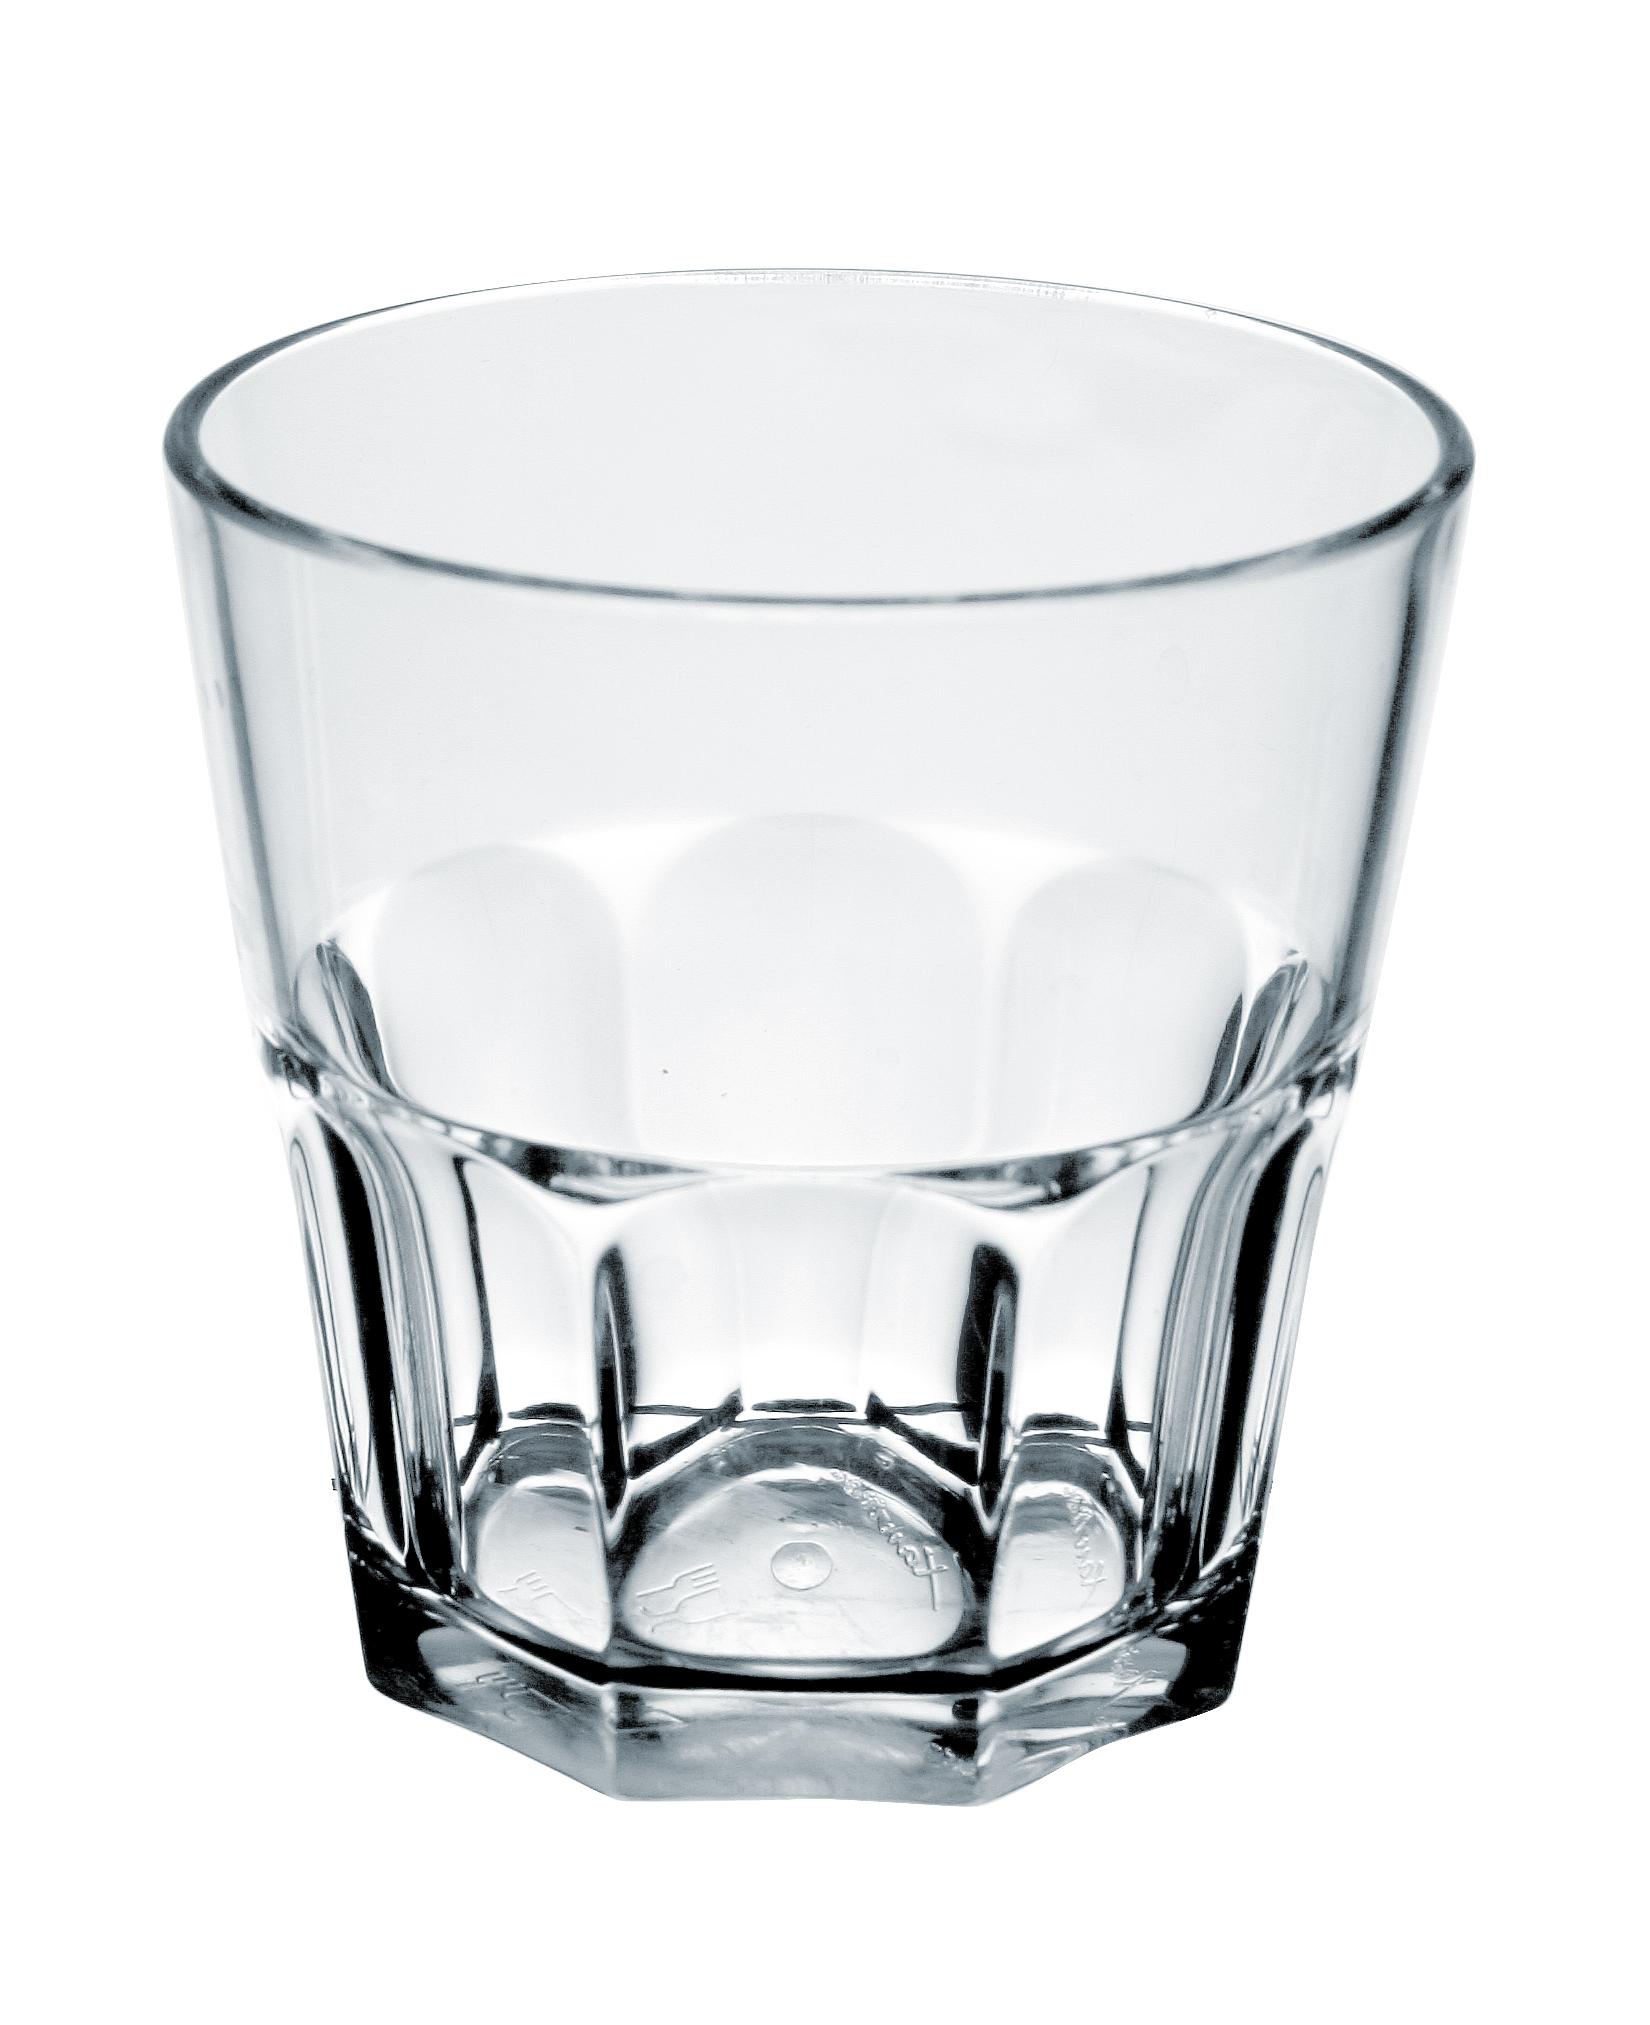 Vattenglas i Tritanplast 22 cl